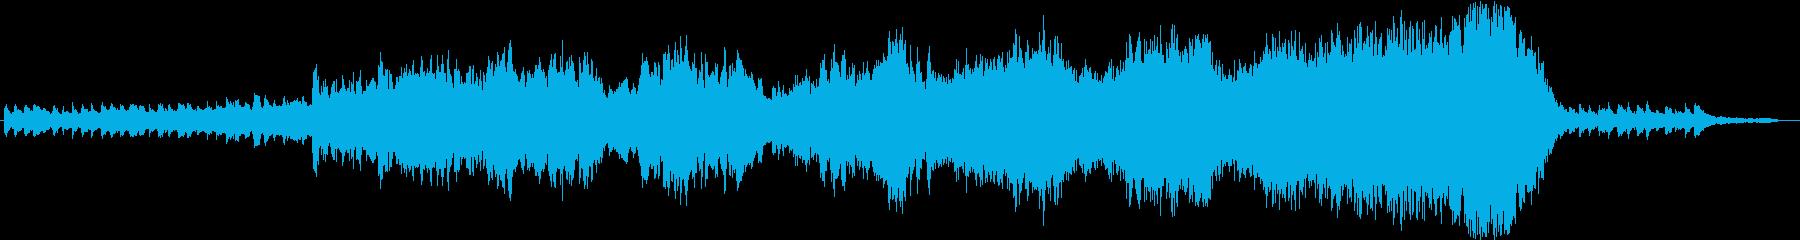 Cold Lake 60秒の再生済みの波形